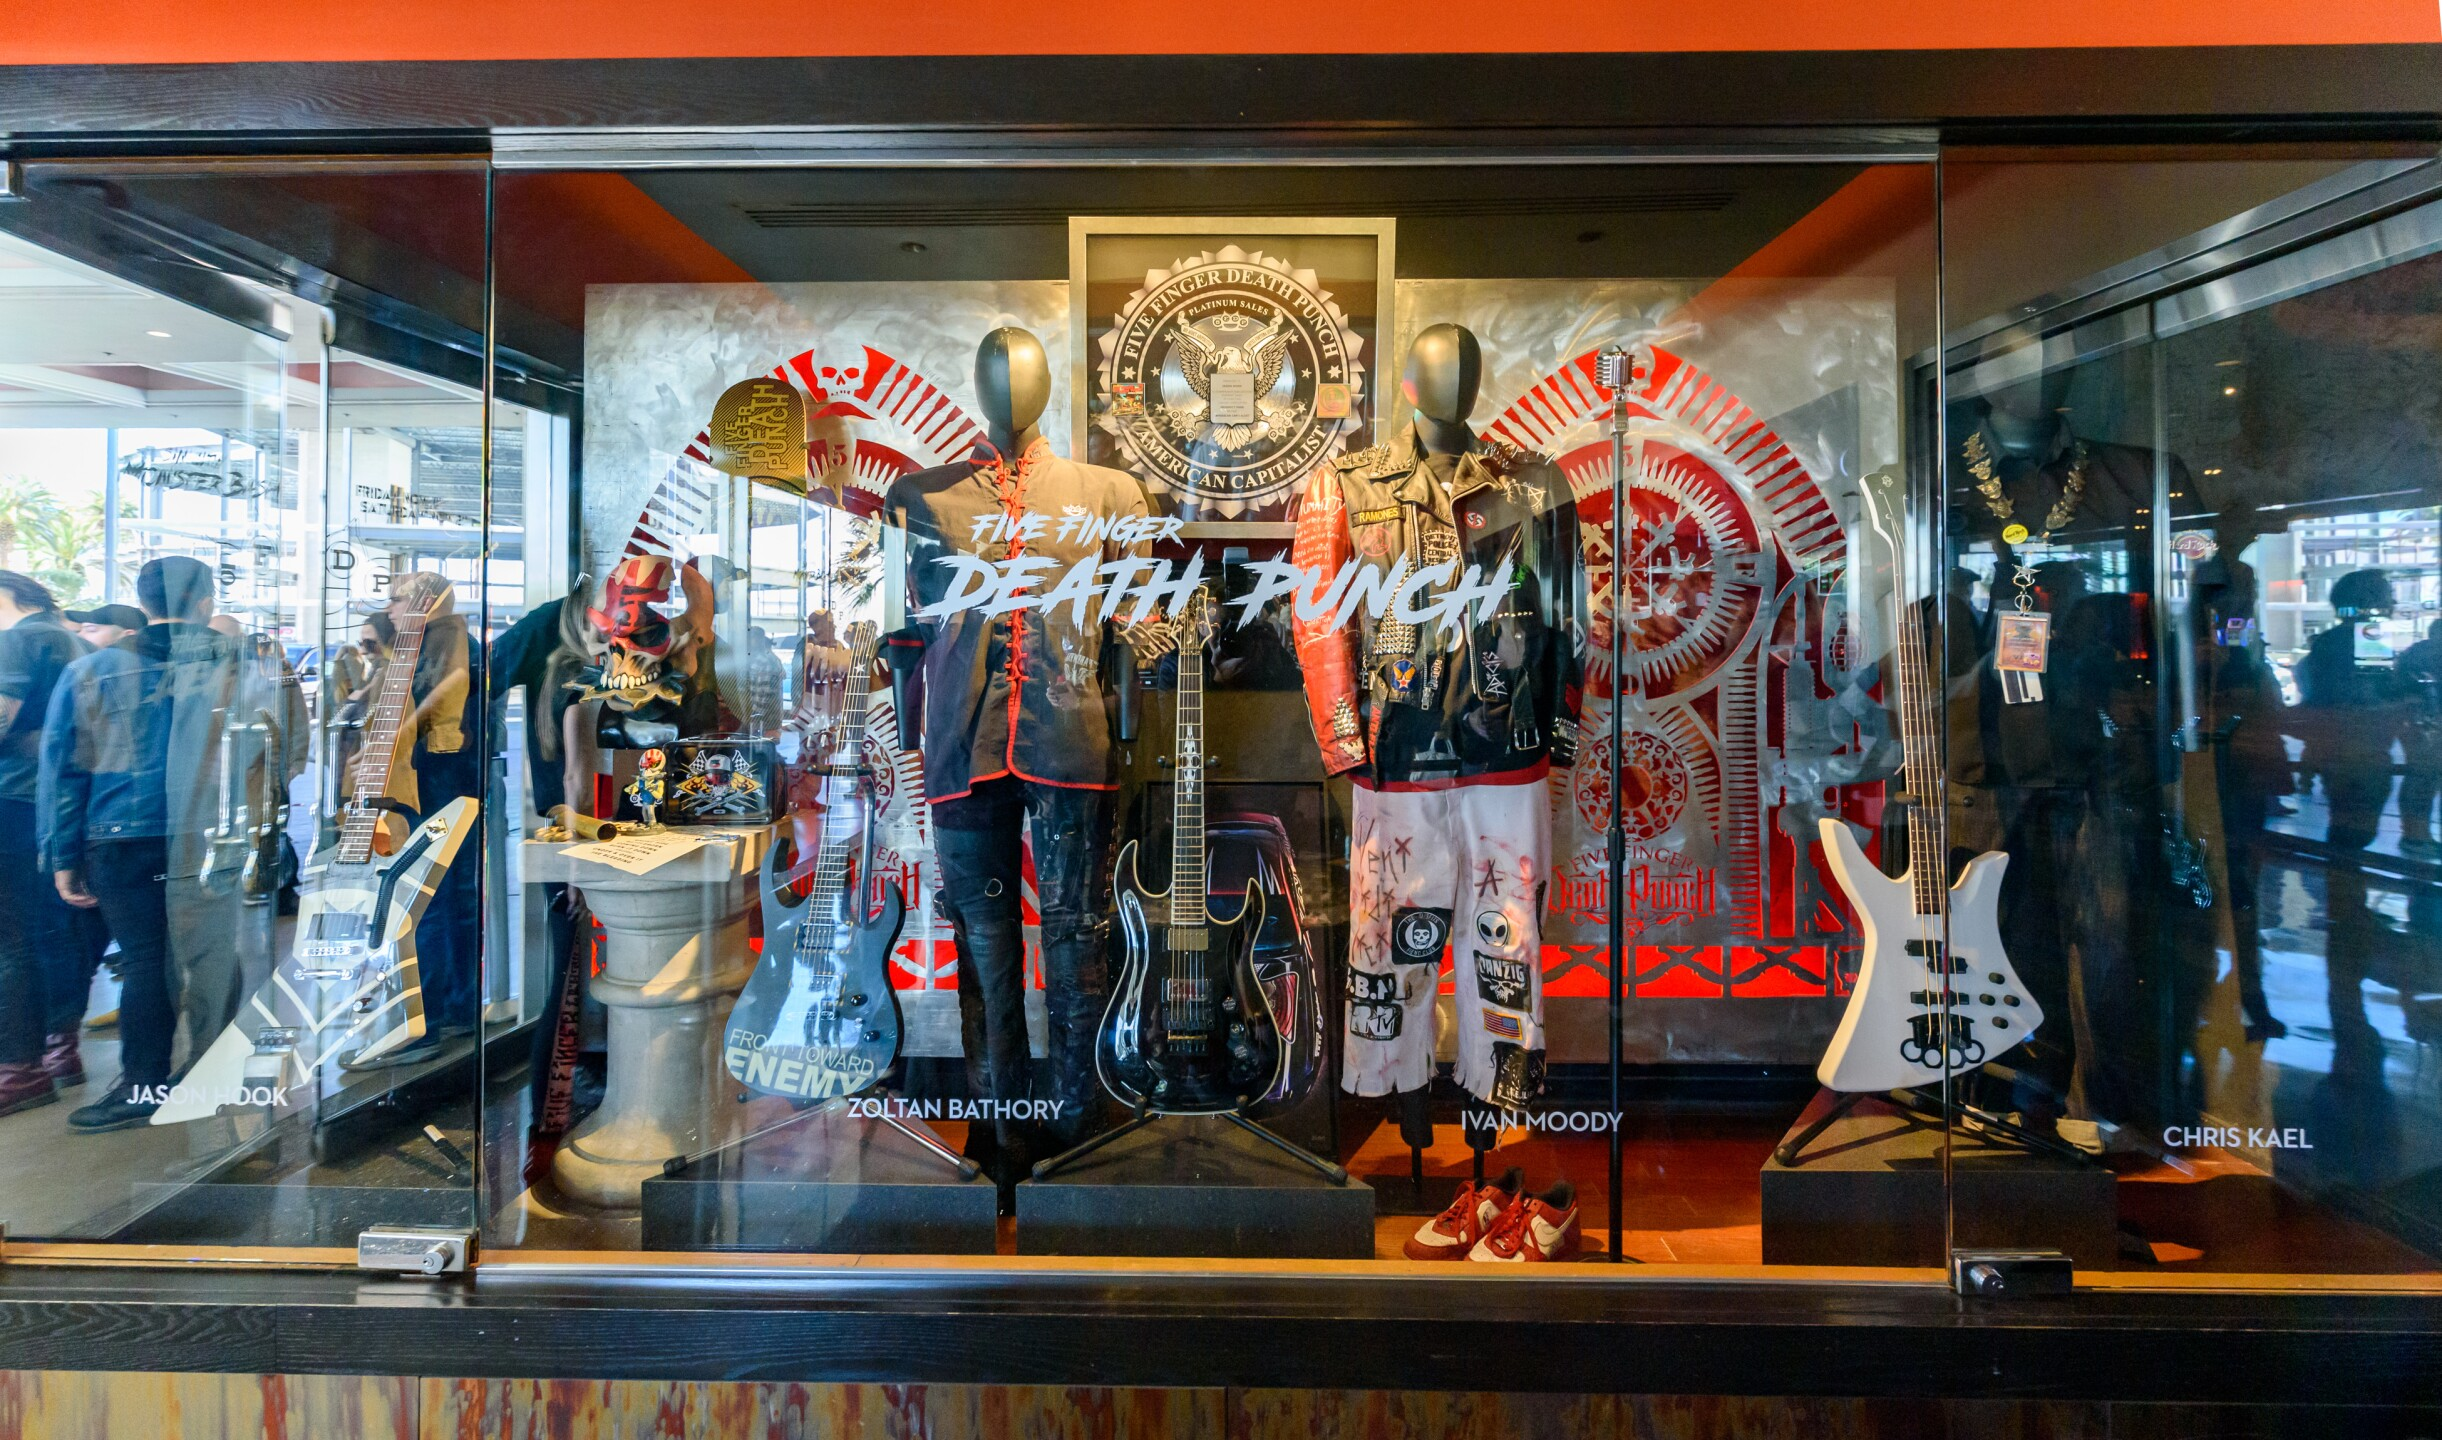 11_01_19_HRH_Five Finger Death Punch Case Unveil_Gray_KPG_63.jpg